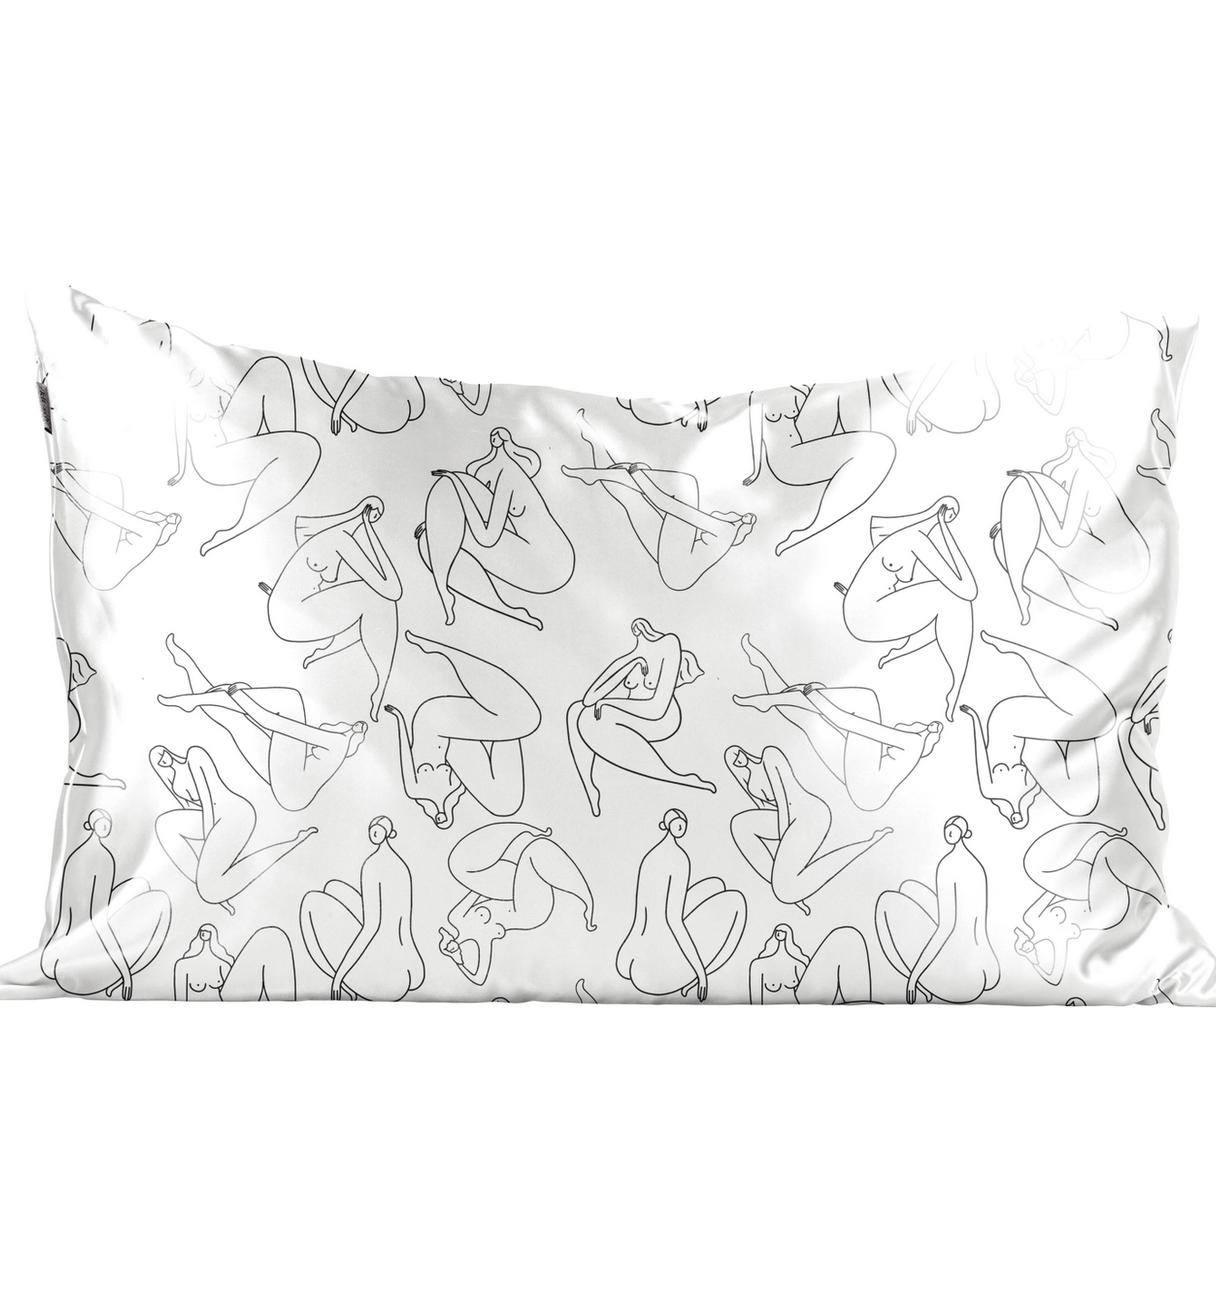 Kitsch Satin Pillowcase - Body Positivity Drawing